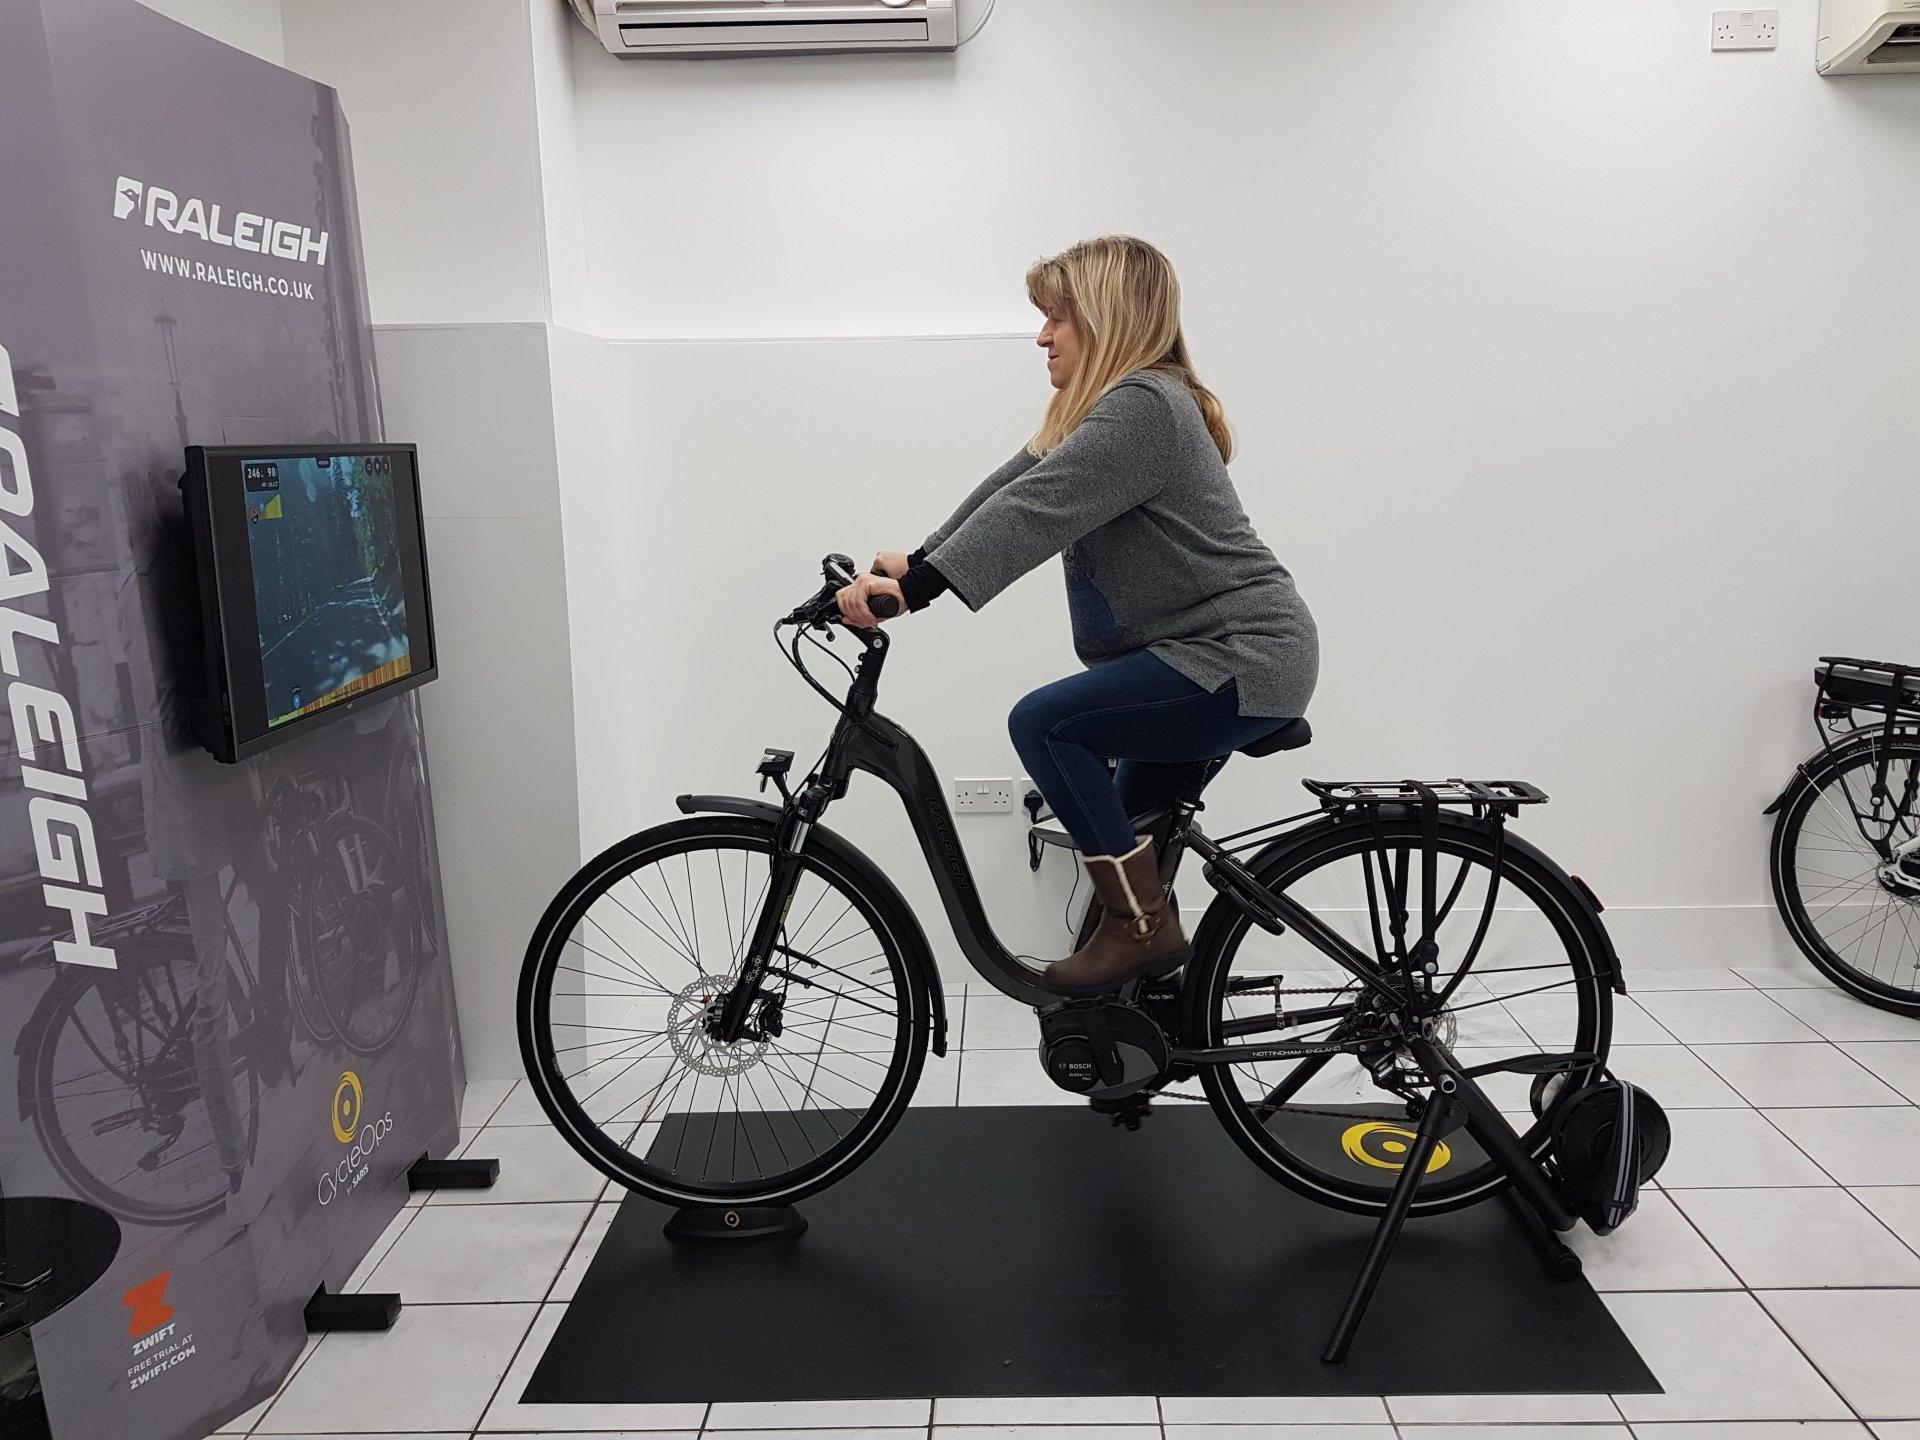 Woman on Raleigh bike simulation